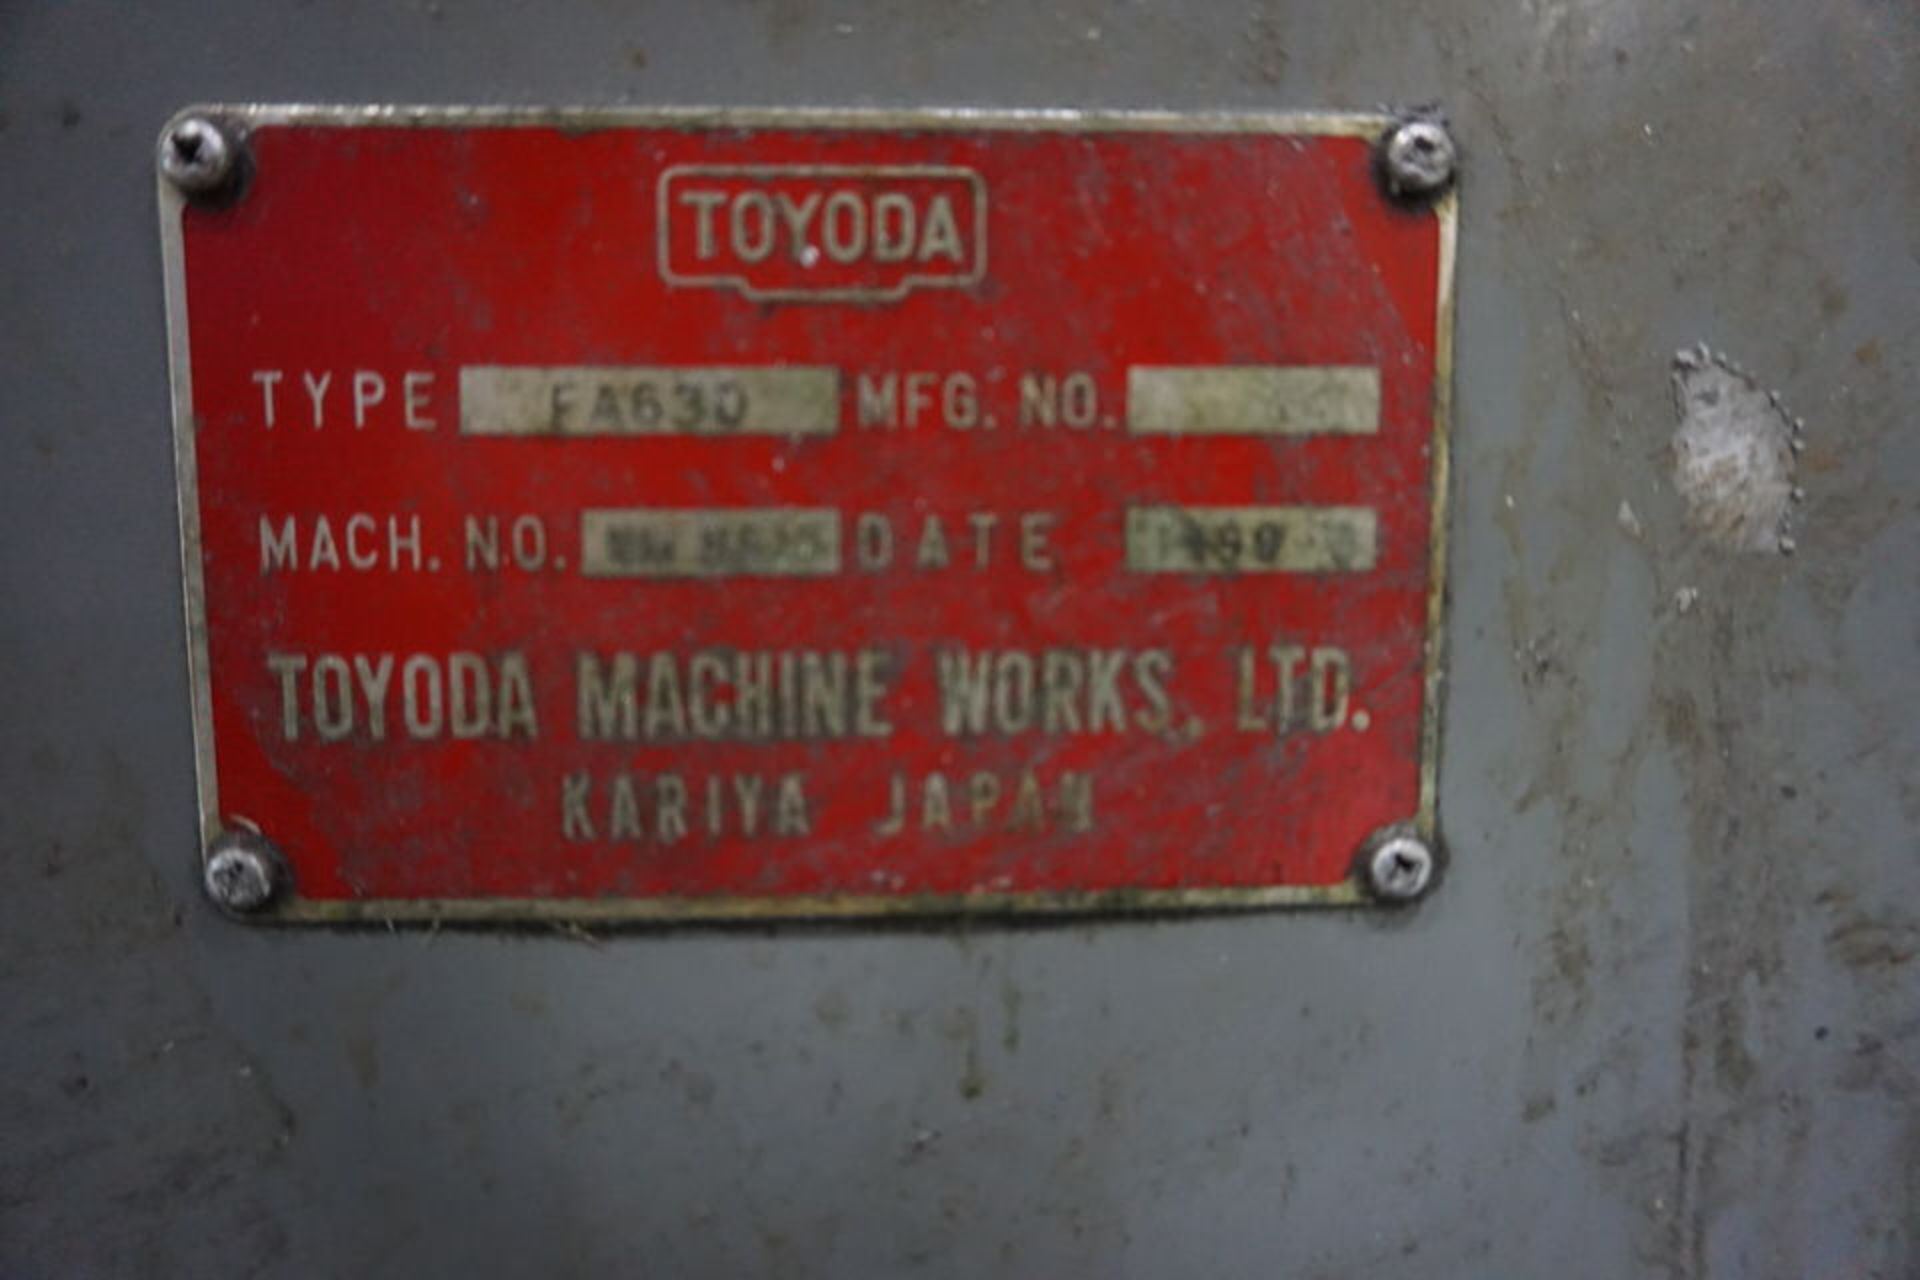 TOYODA HORIZONTAL MILLING MACHINE, DOM:1998 (ASST#: P772100) - Image 2 of 9